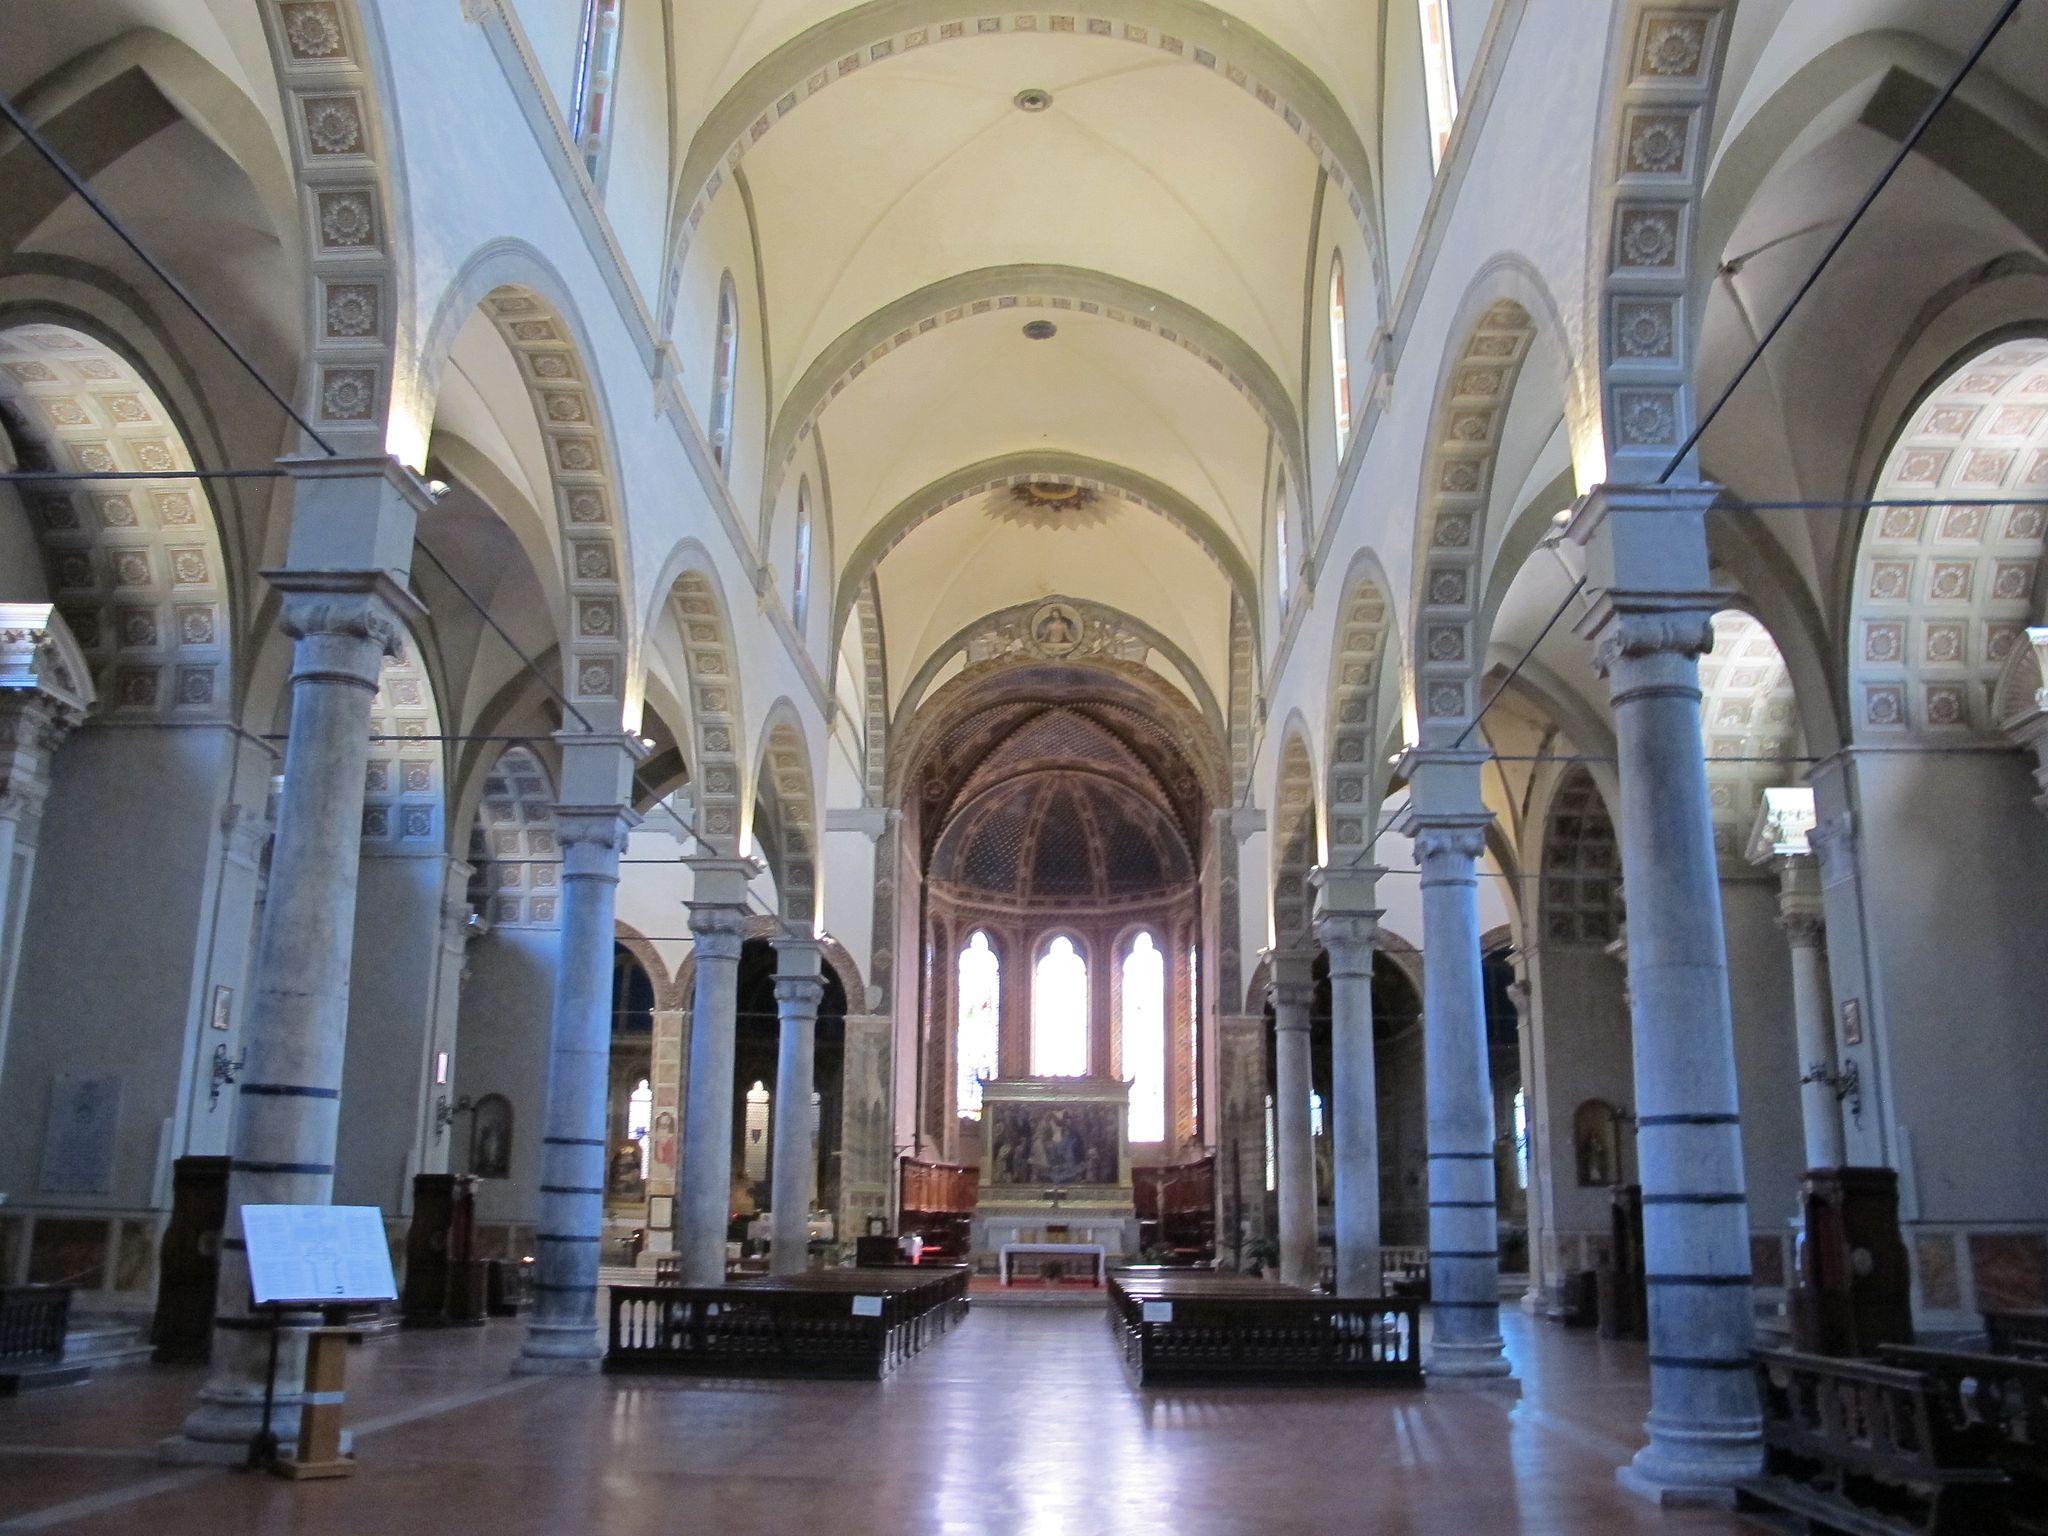 Basilica dei servi, siena 04